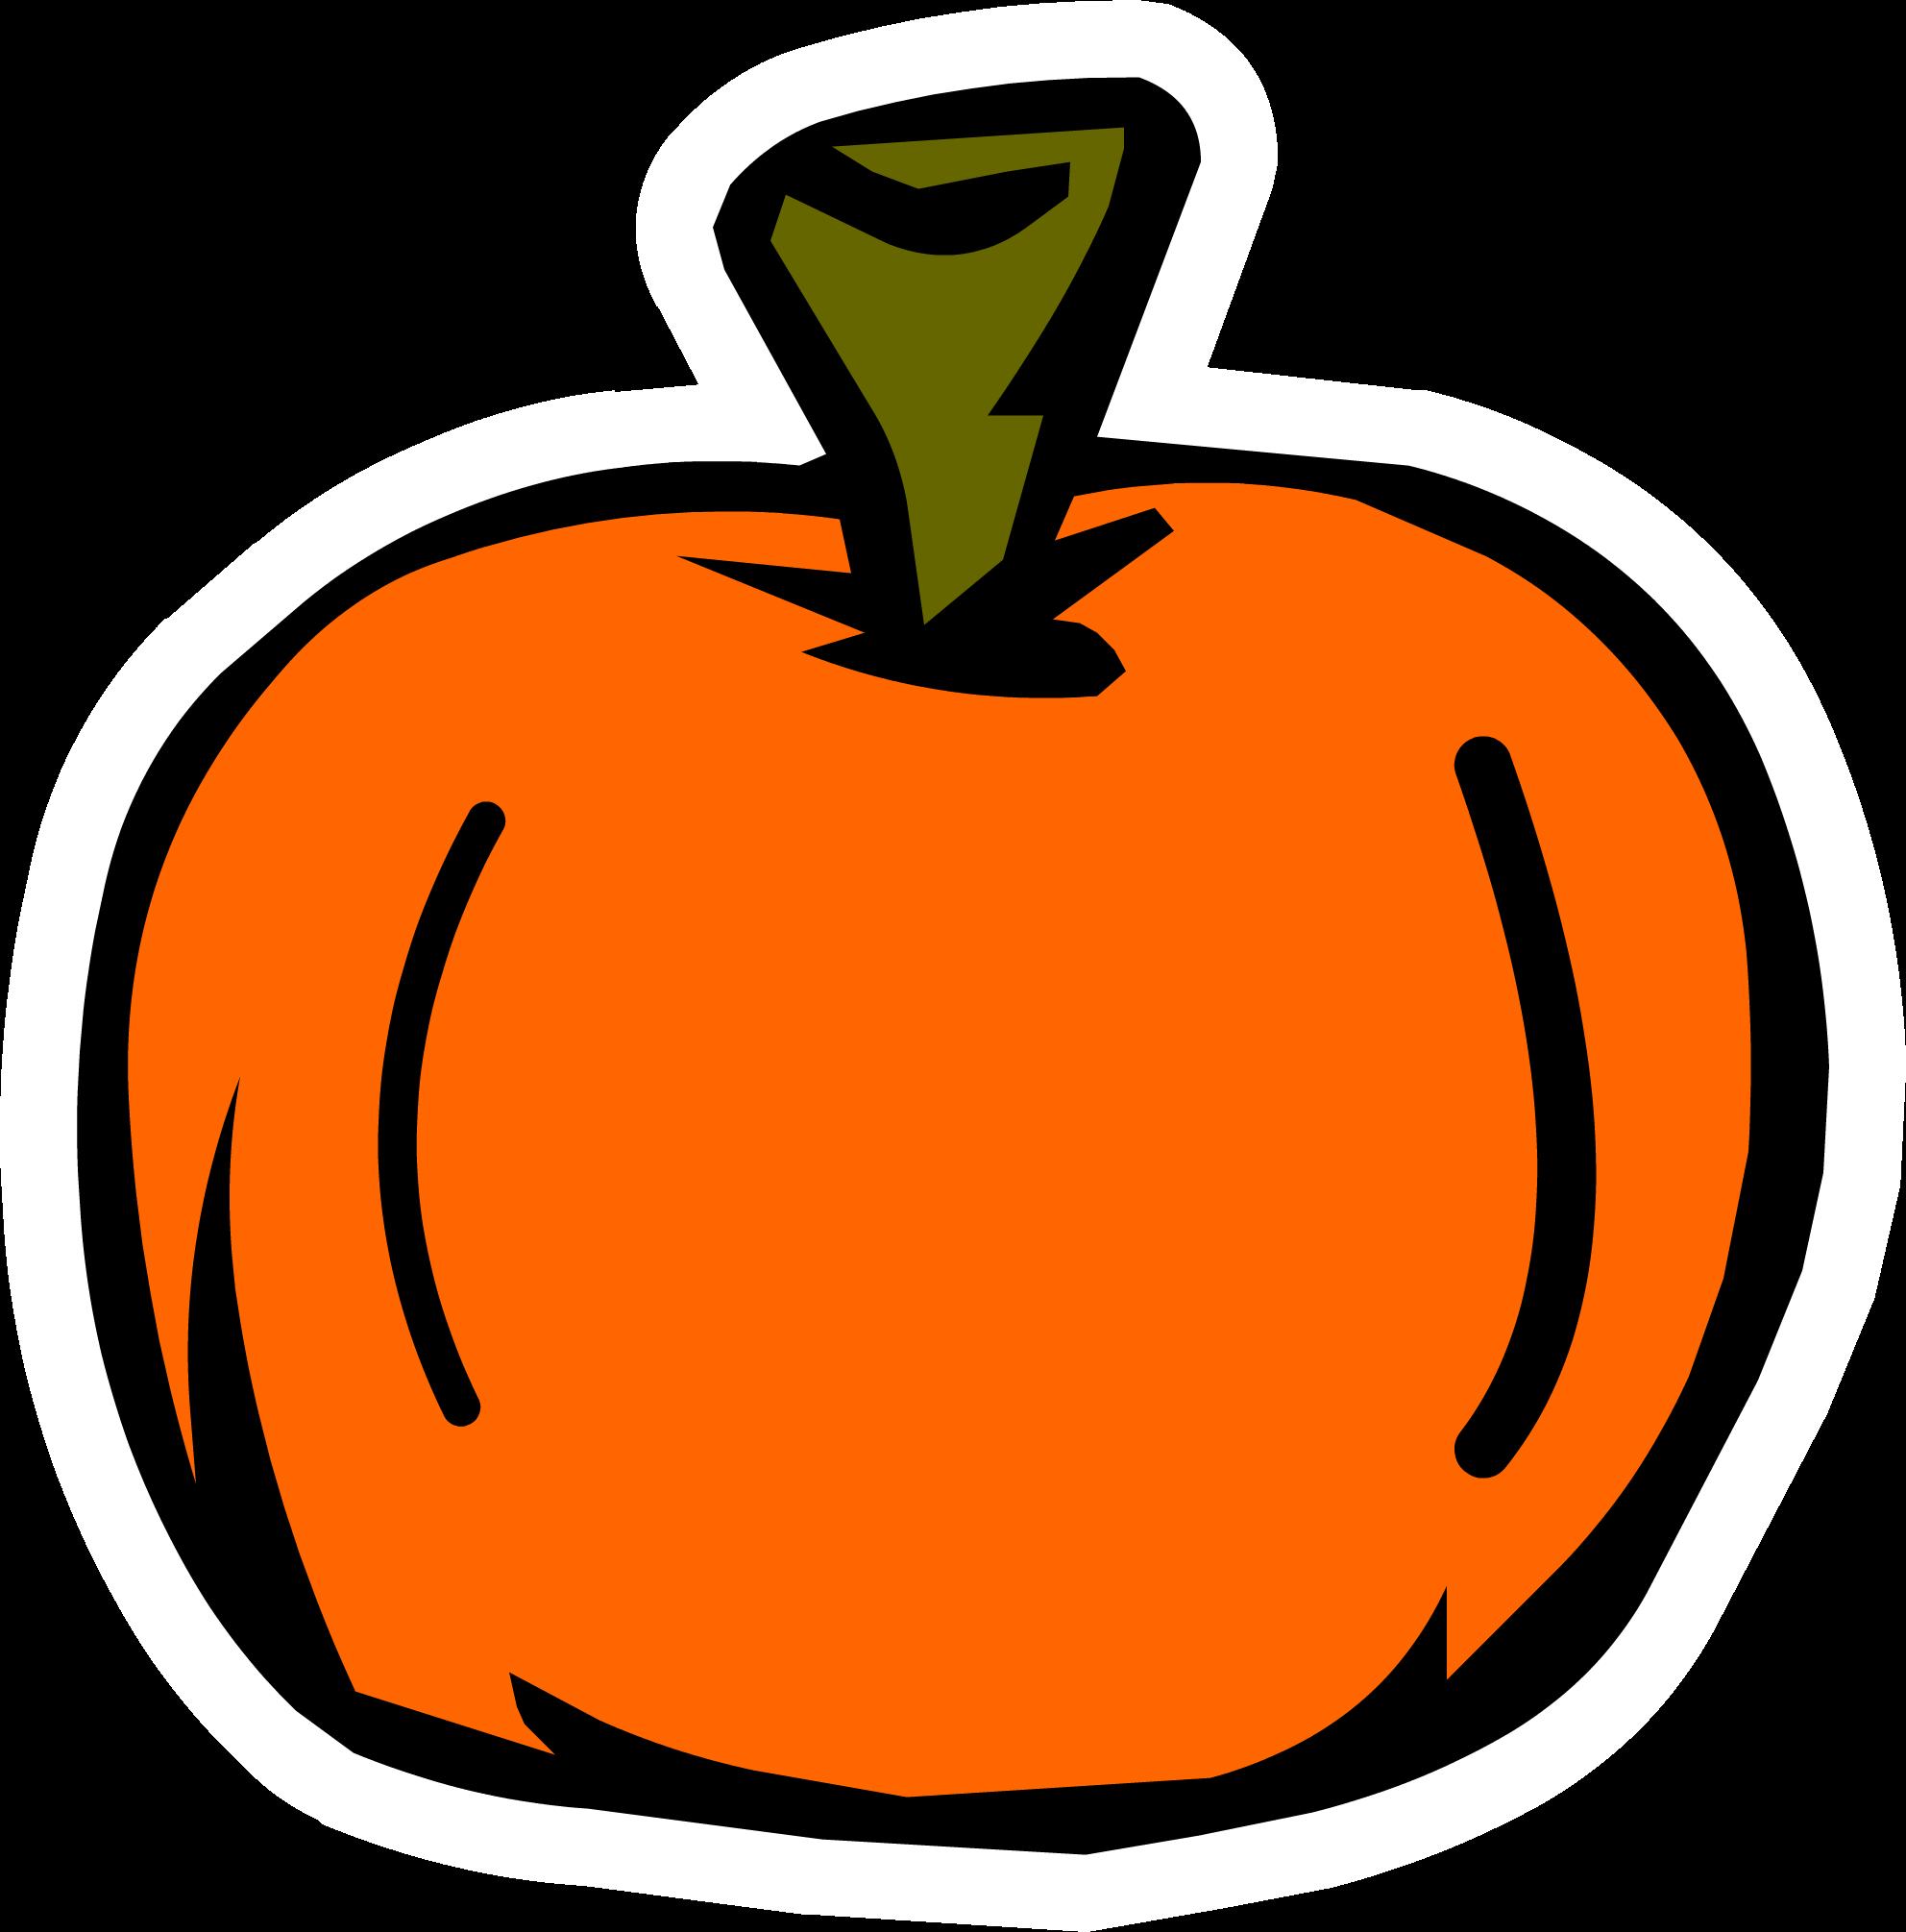 Free clipart pumpkin toothbrush clip art freeuse List of Pins | Club Penguin Rewritten Wiki | FANDOM powered by Wikia clip art freeuse